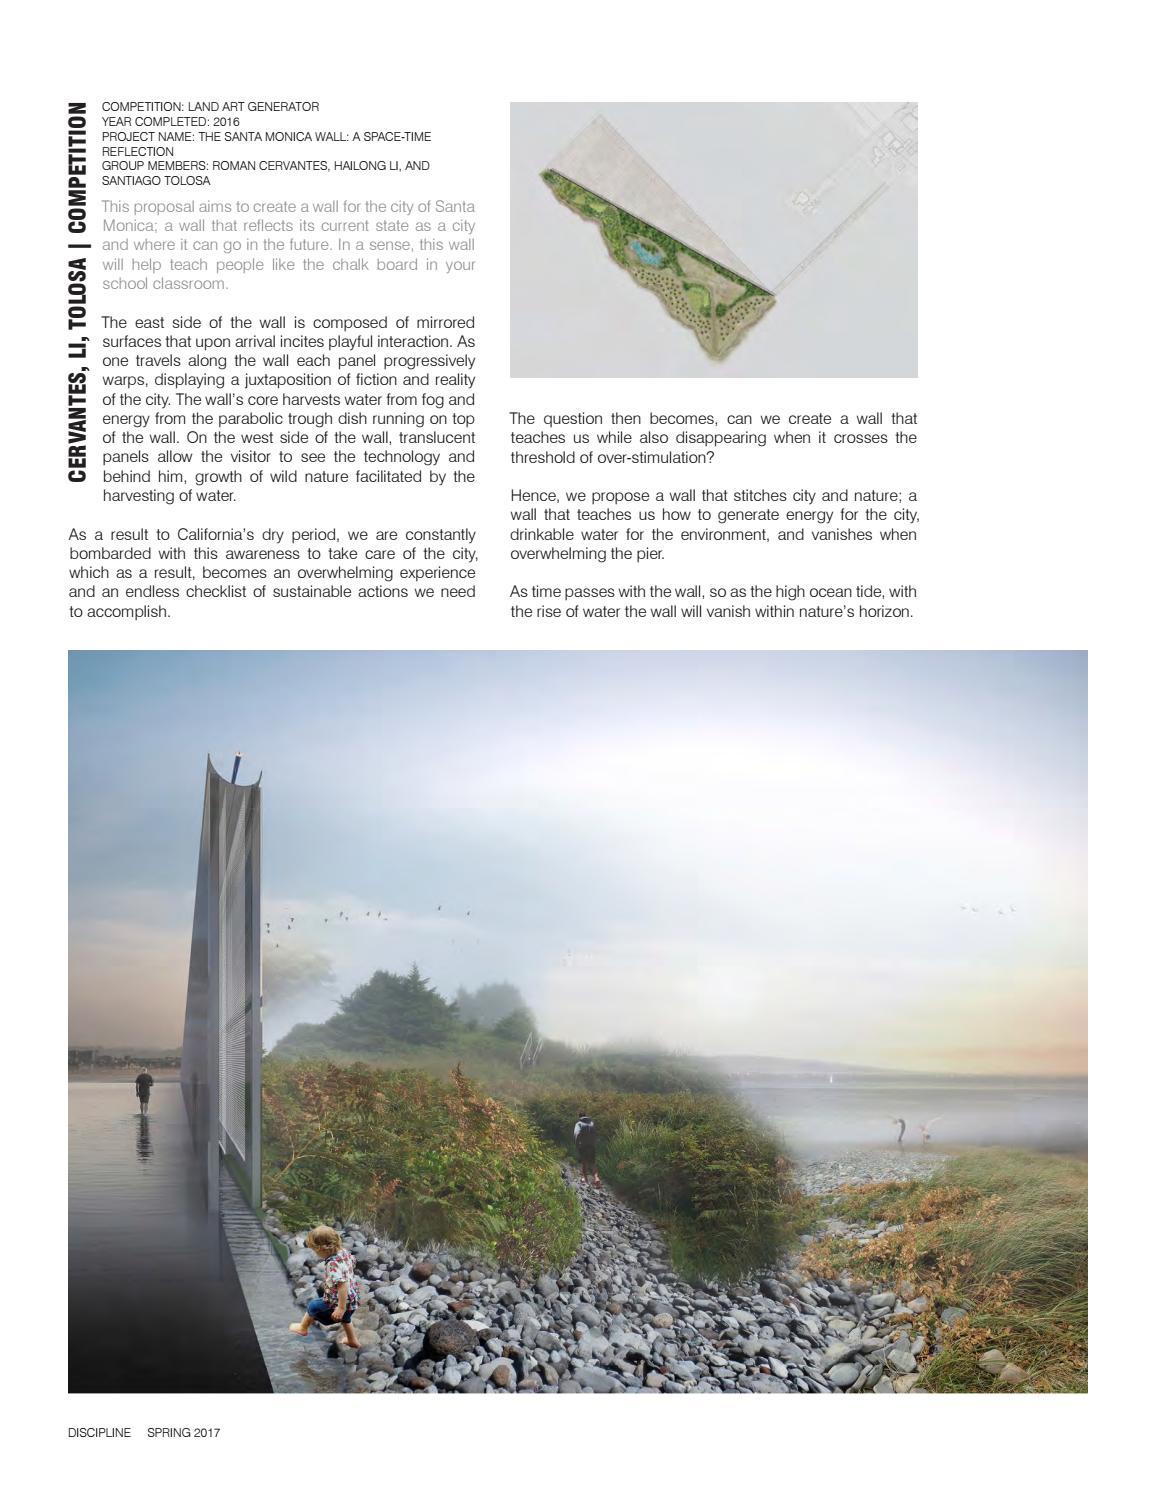 Discipline: ASU Architecture Journal 03 by The Design School